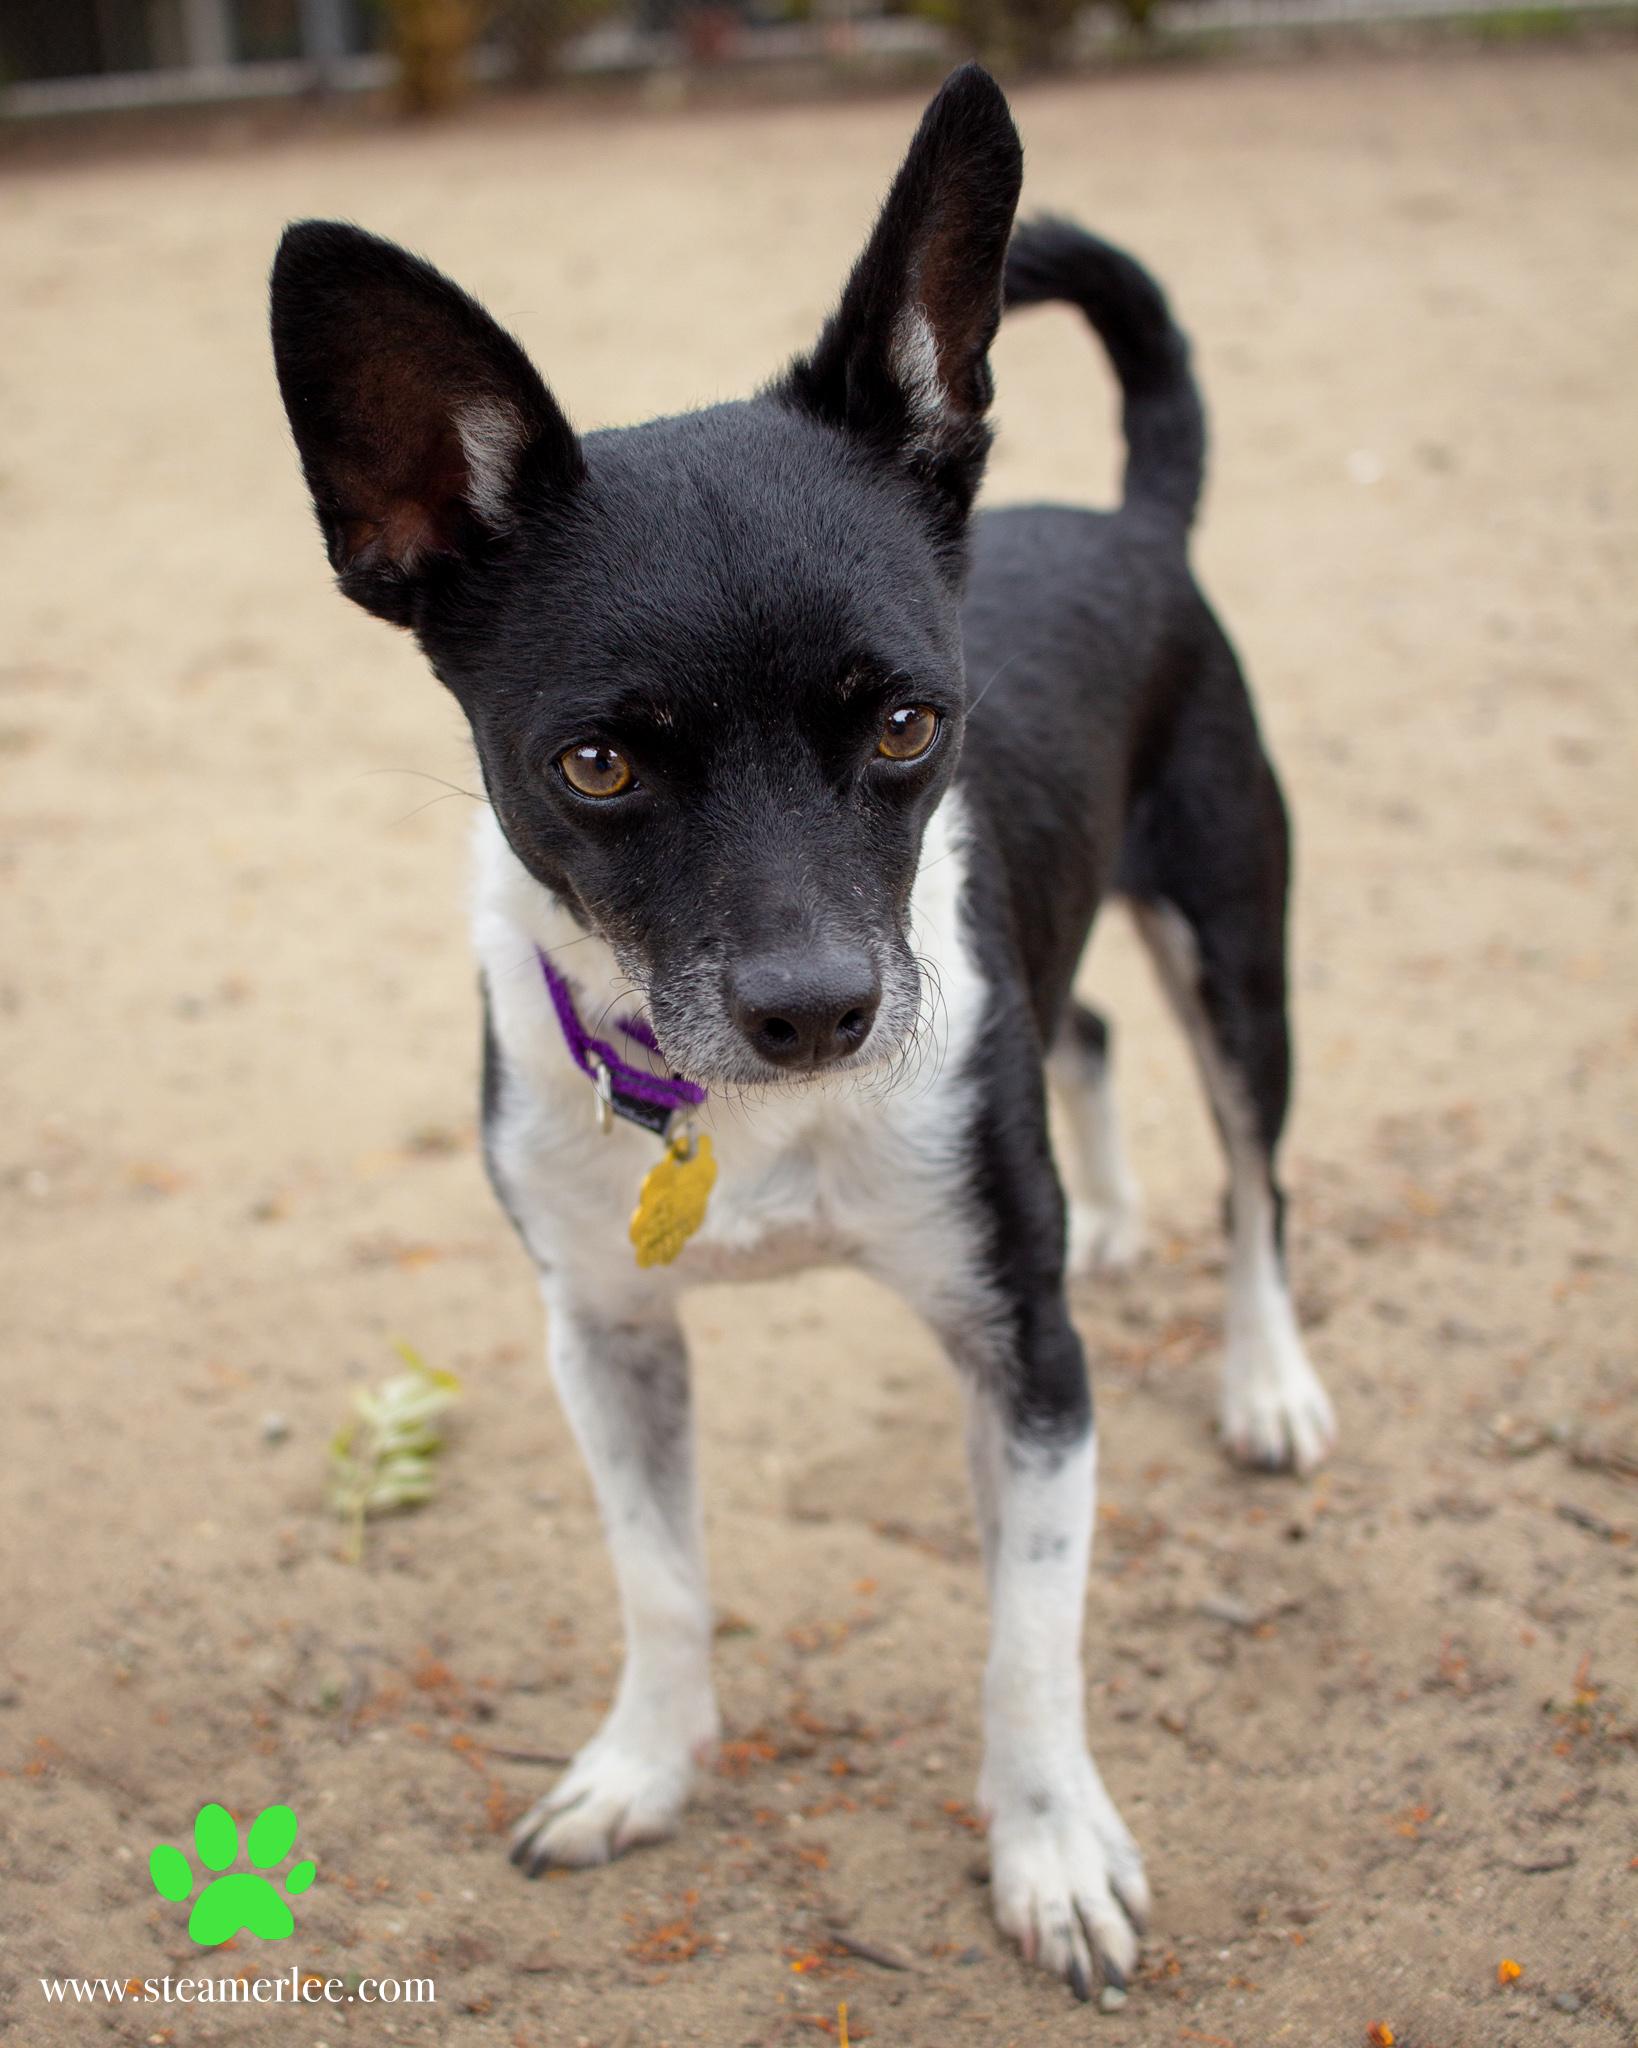 355-Orange-County-Dog-Photography-Steamer-Lee-Southern-California-SBACC.JPG